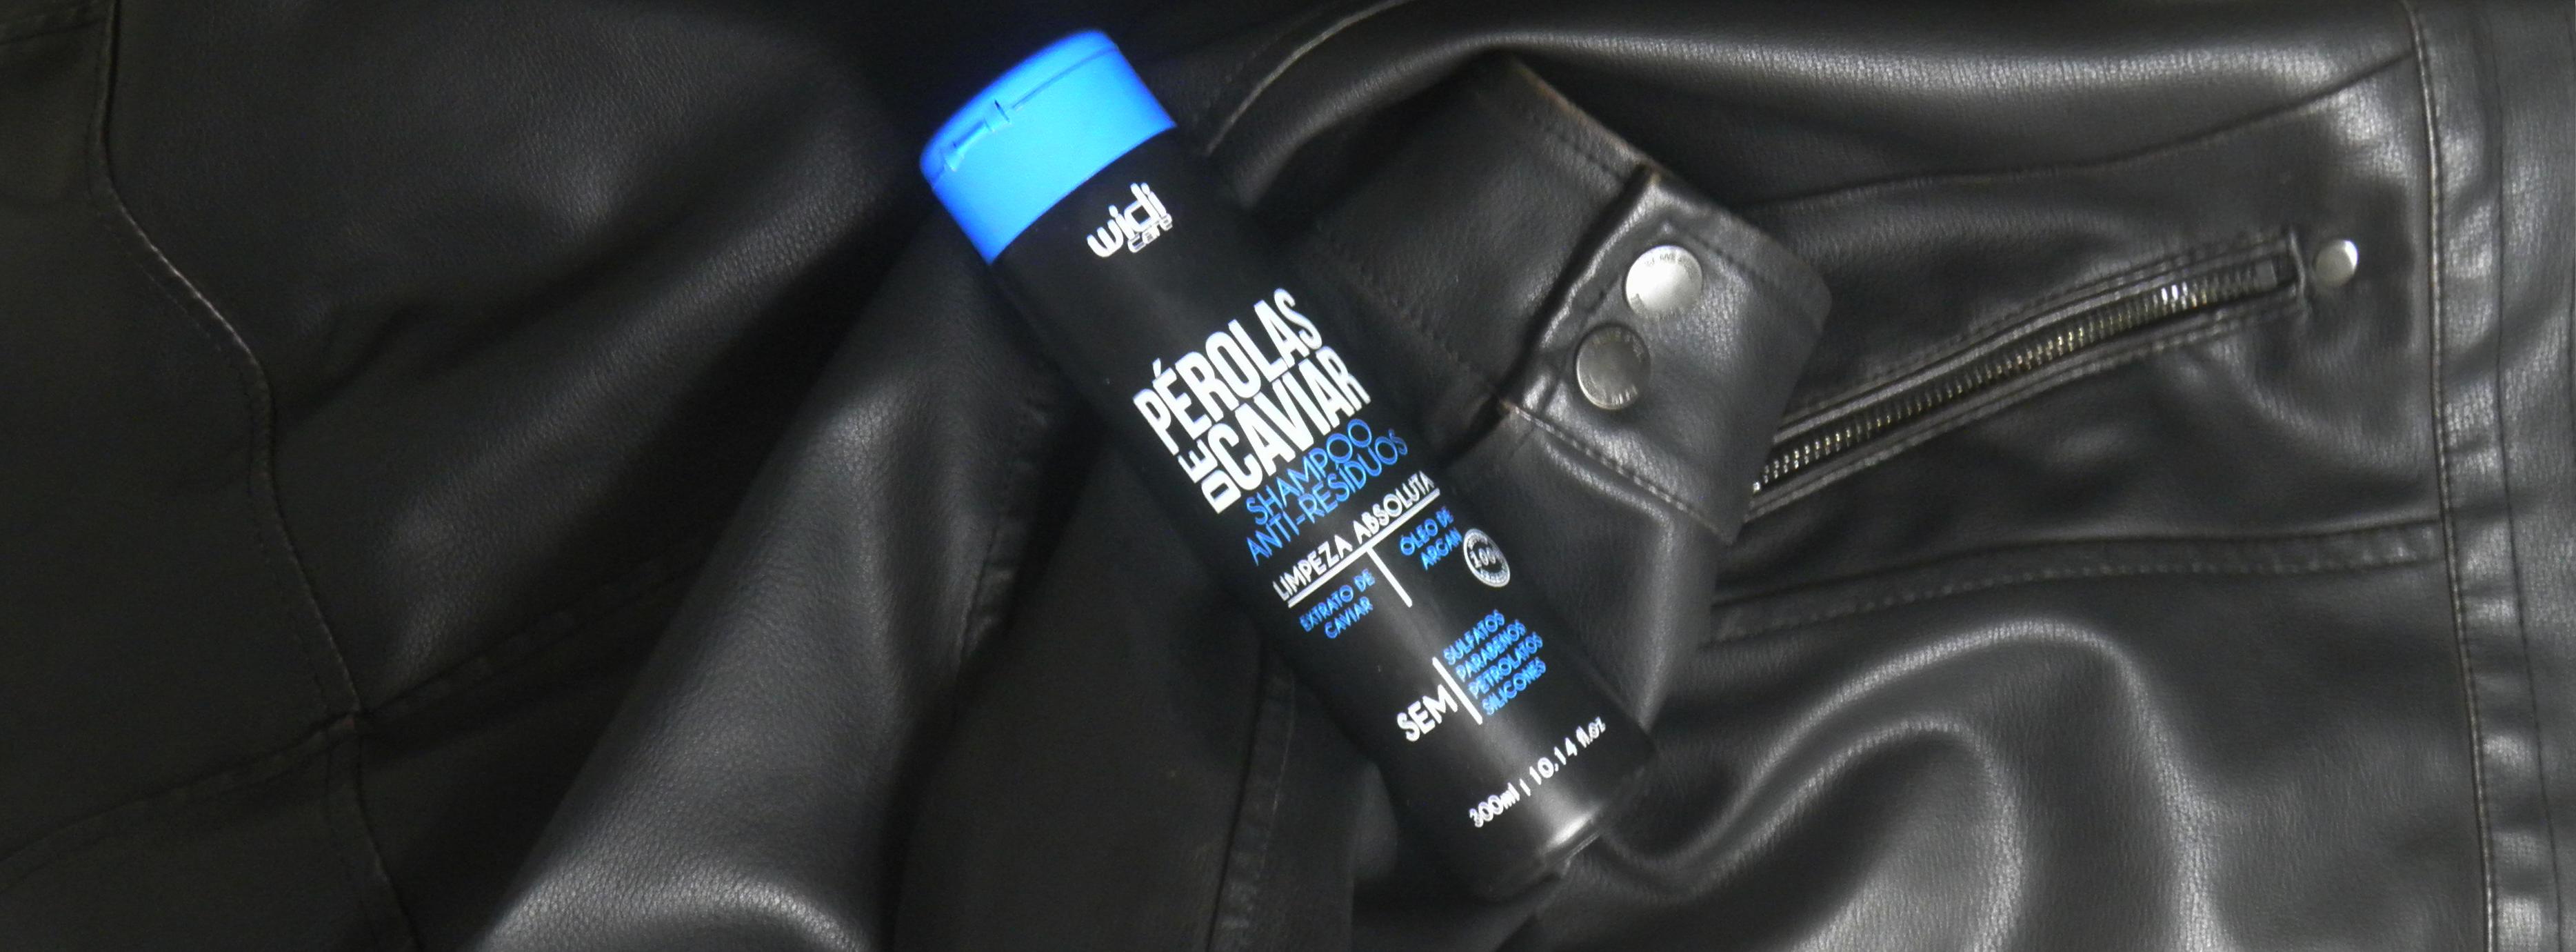 Resenha Shampoo Antirresíduos Low Poo Pérolas de Caviar Widi Care